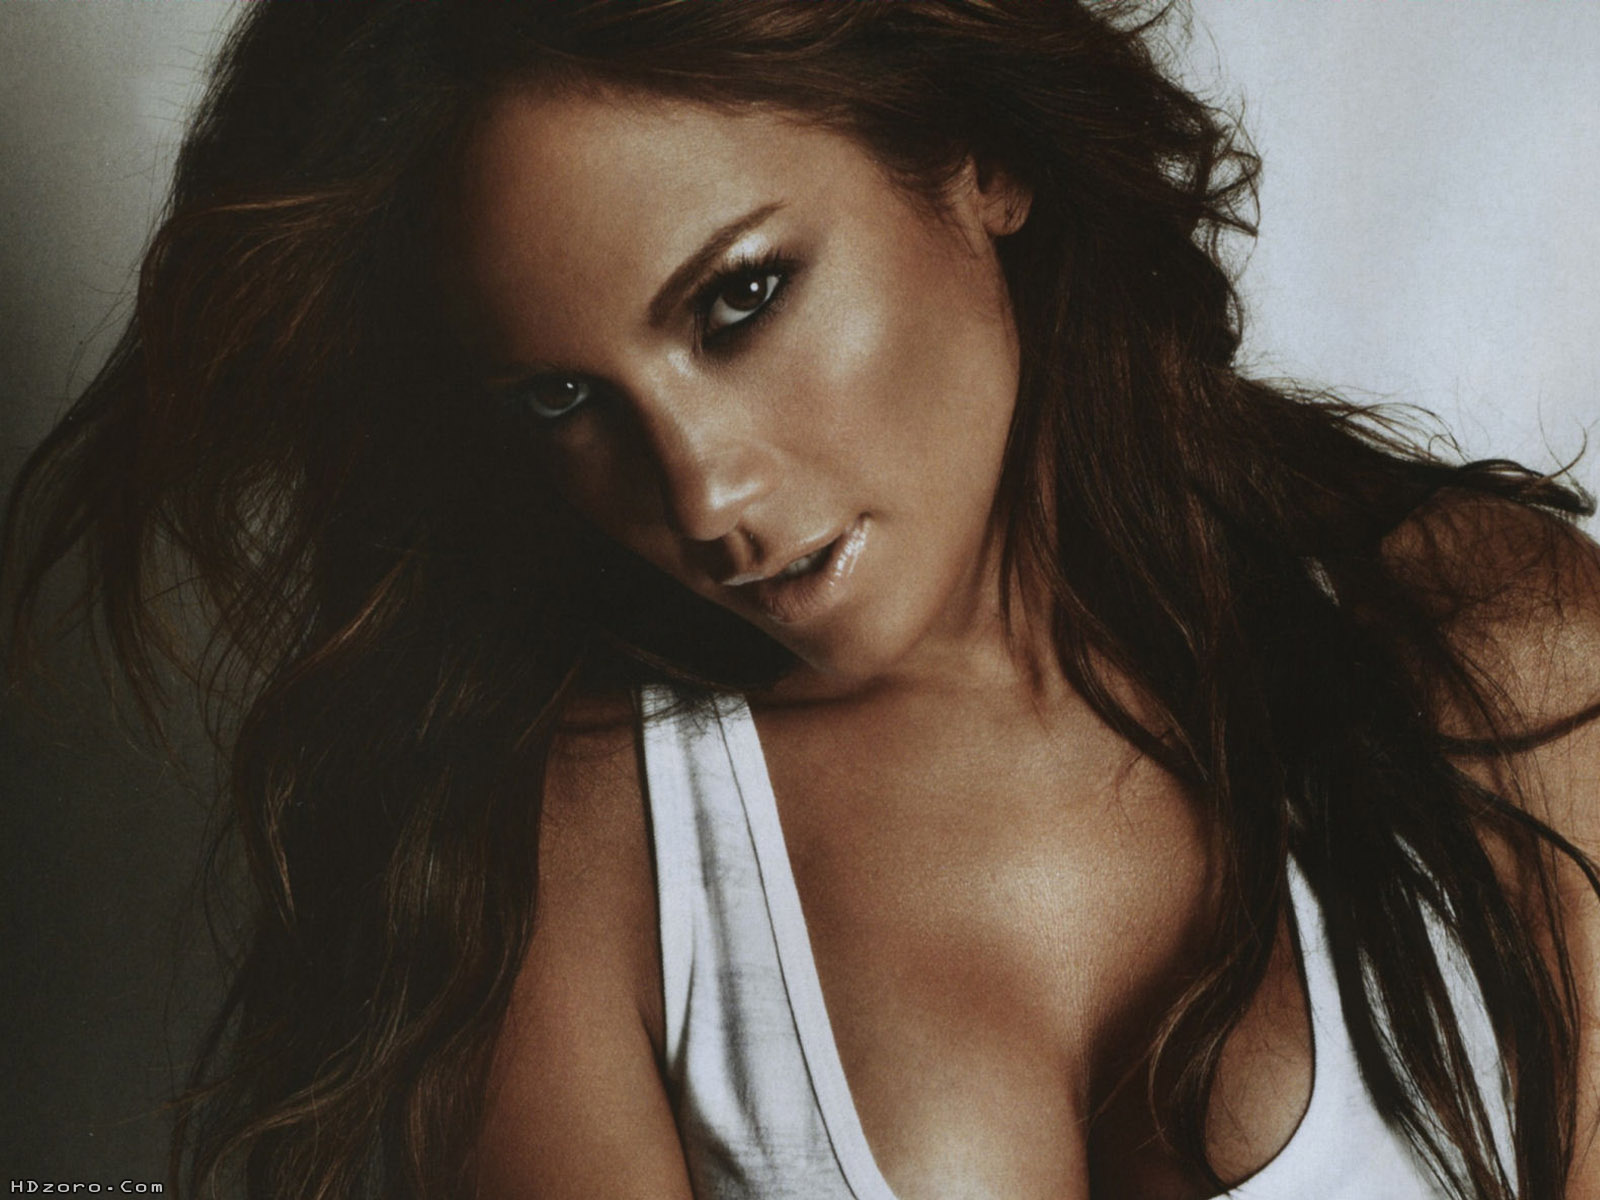 http://3.bp.blogspot.com/-bwKcUrulUUY/UUldJ09SIOI/AAAAAAAARIo/hEuNk5C2LWU/s1600/Jennifer+Lopez+1.jpg